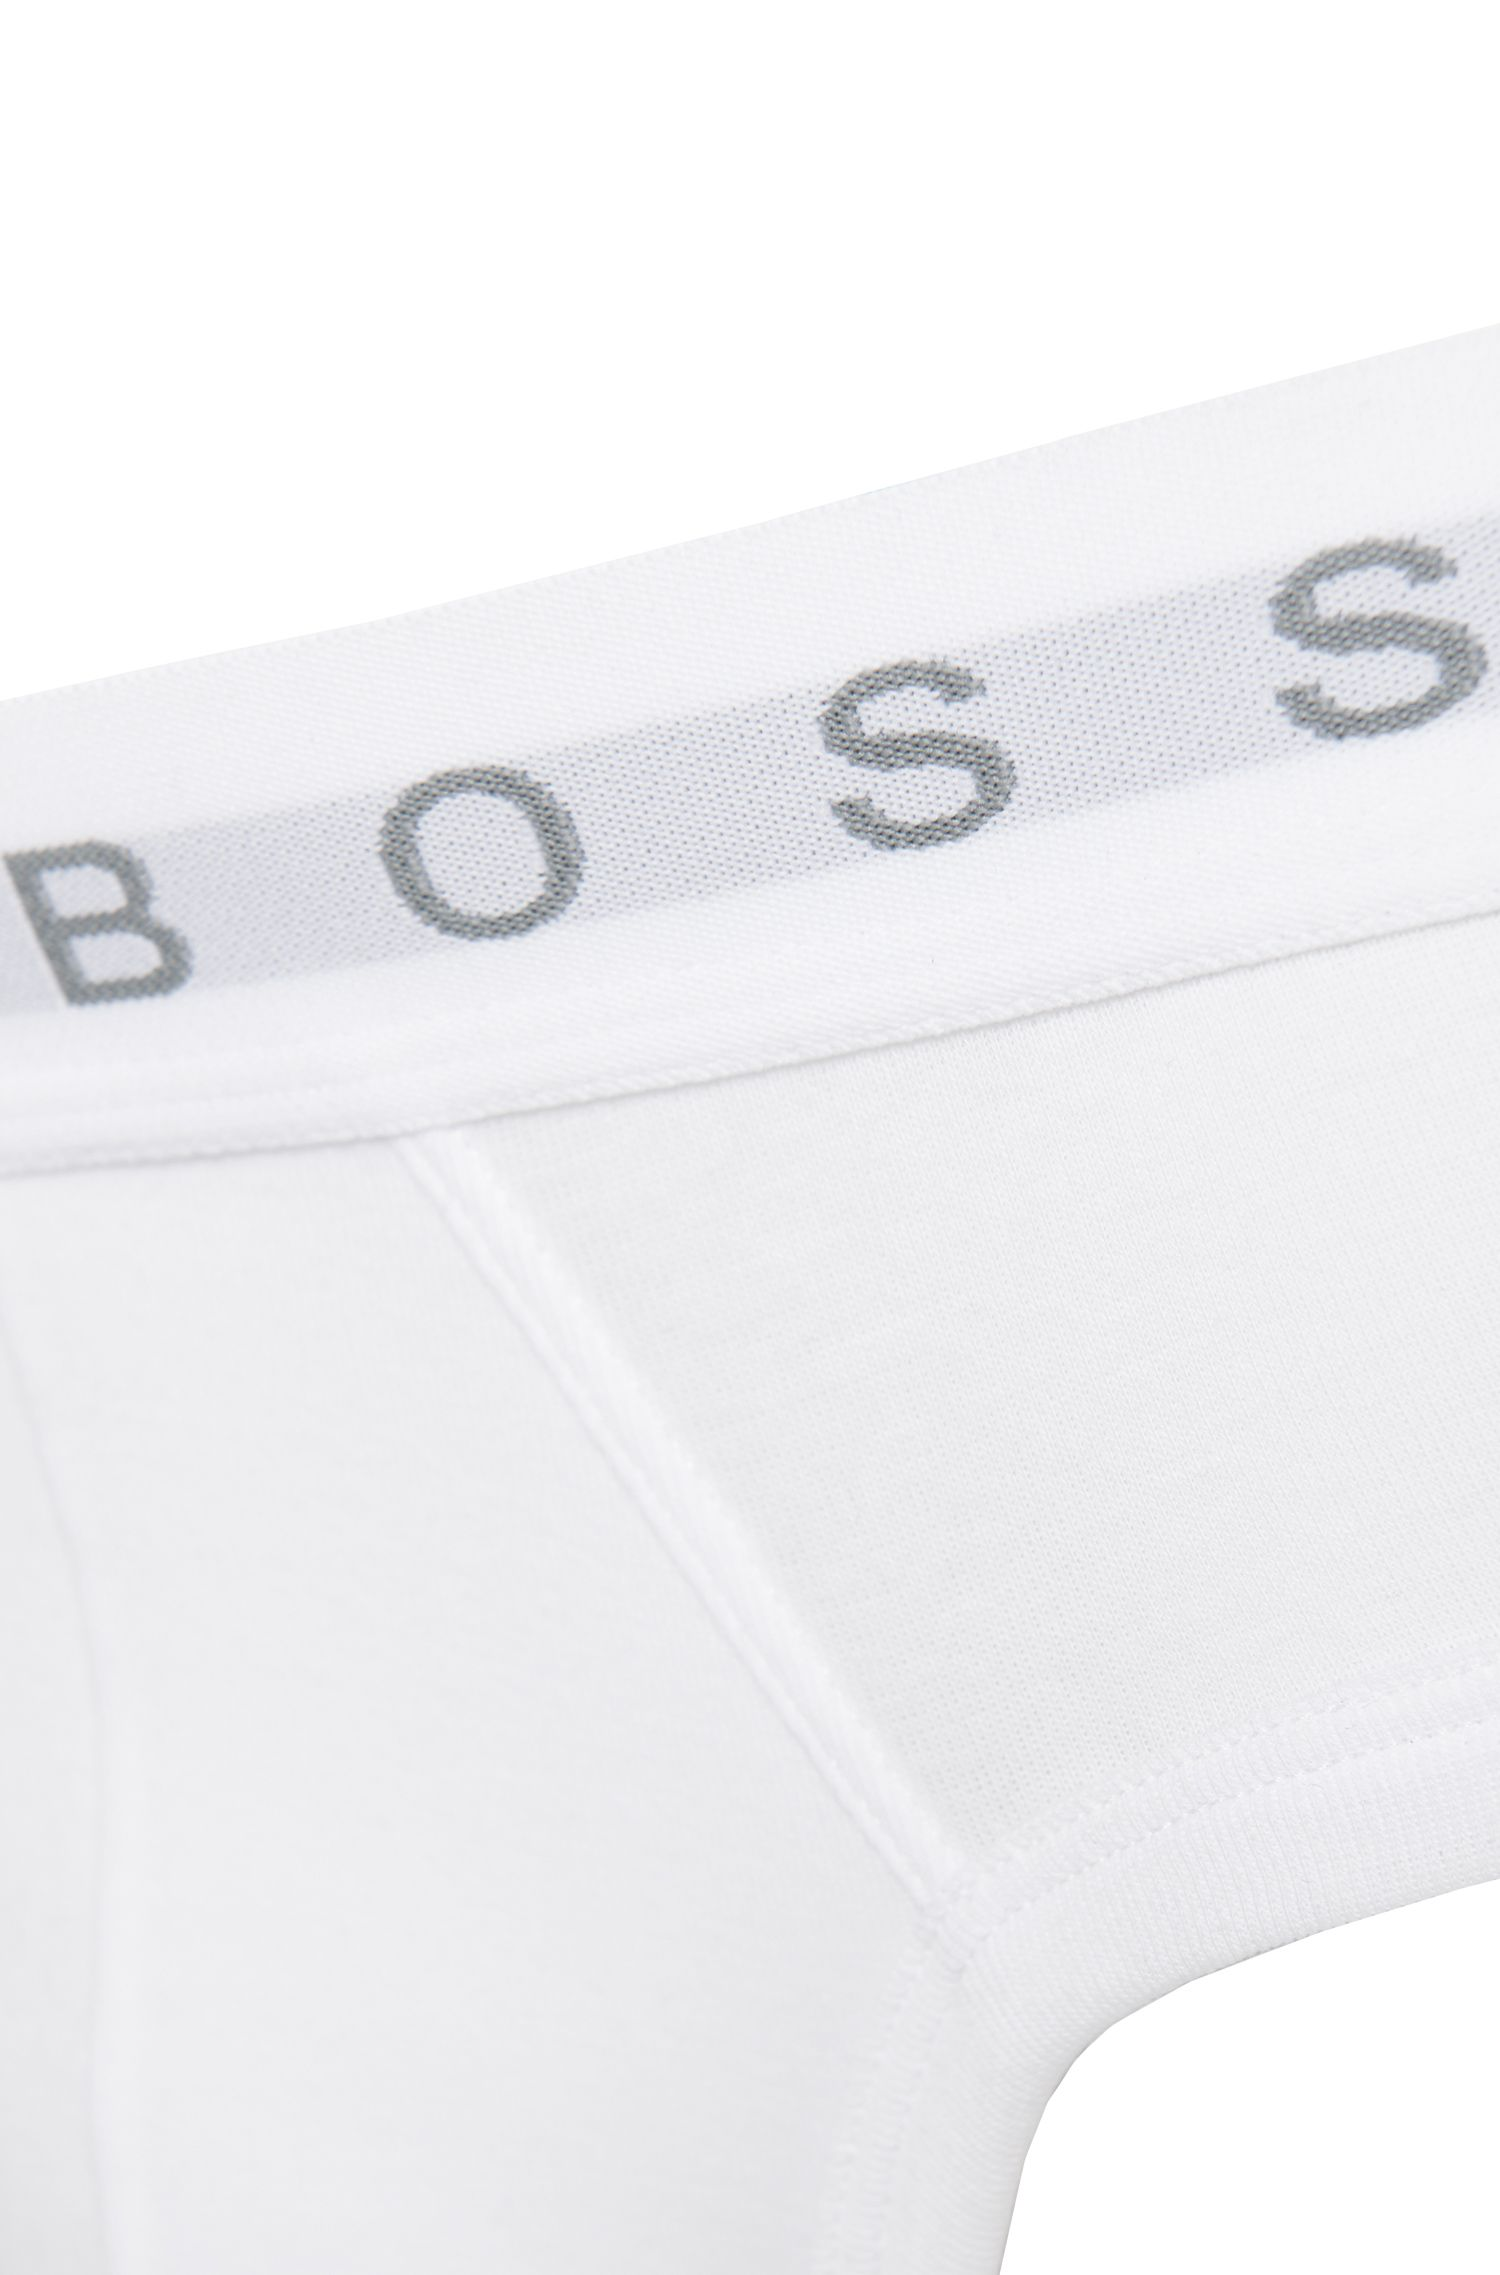 Calzoncillos cortos en puro algodón con detalle de logo